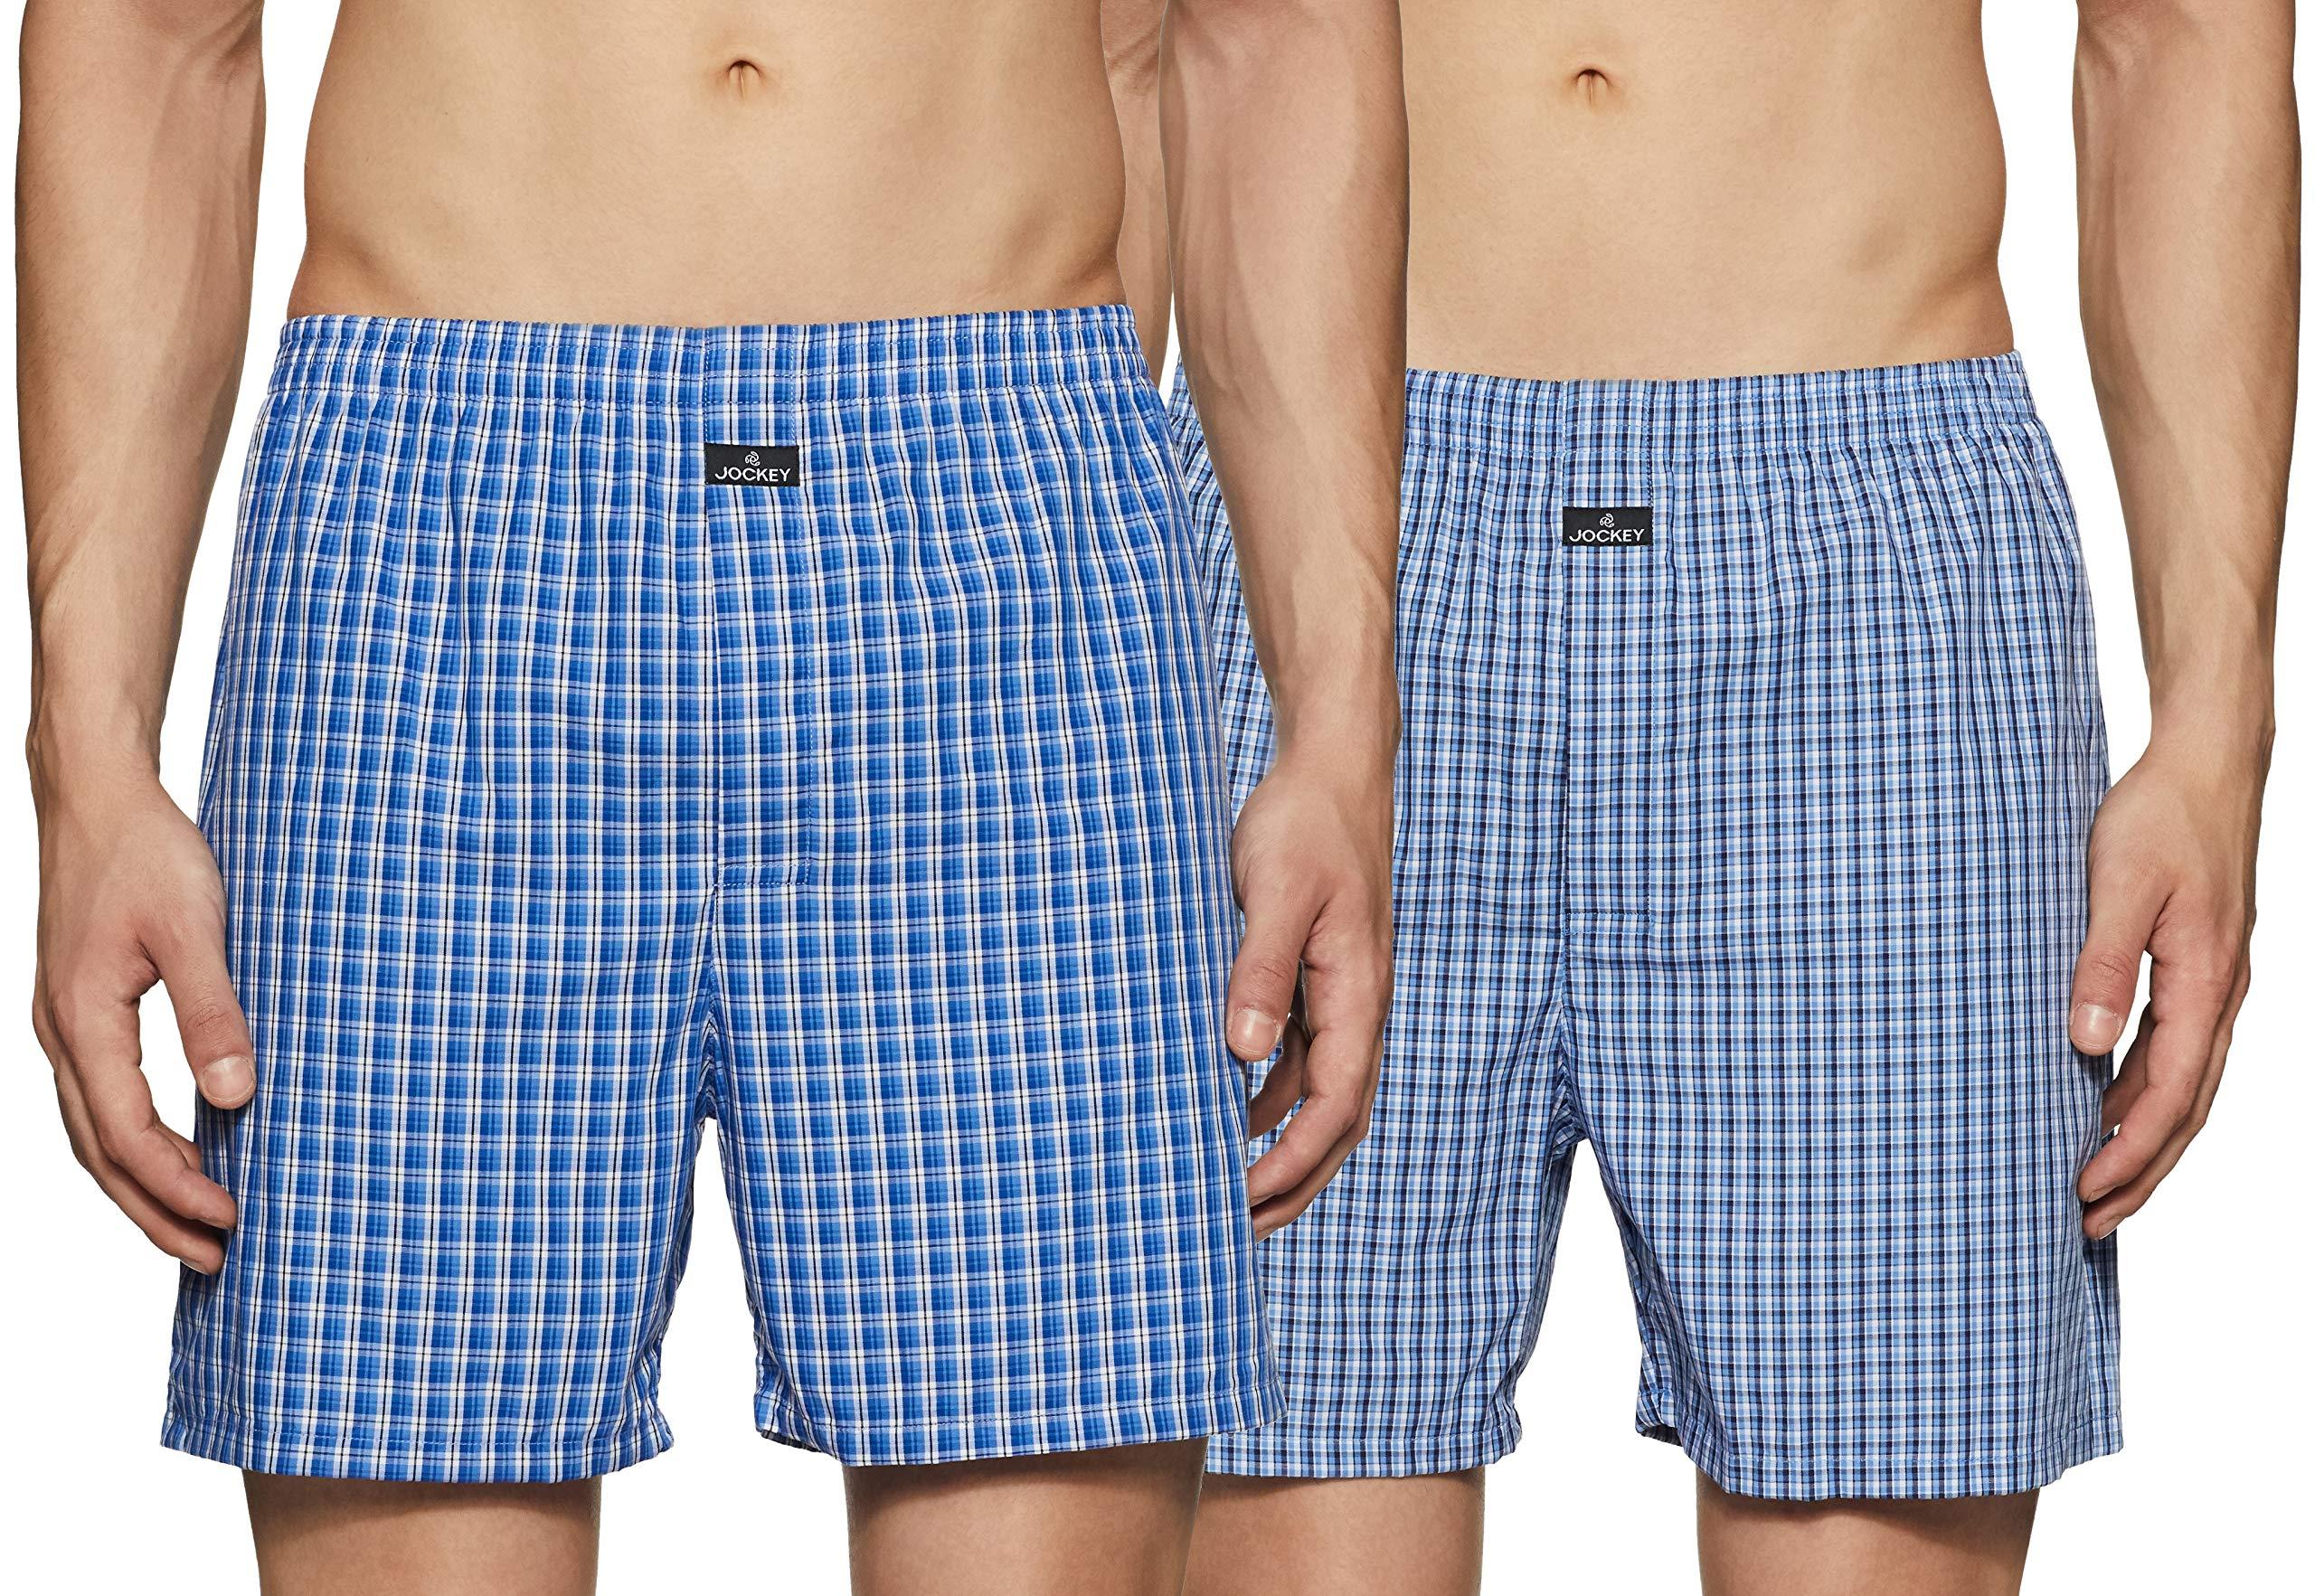 Jockey Men's Cotton Boxers (Pack of 2)(1222-0210-ASSTD Boxer Shorts M) (B0090E1DOE) Amazon Price History, Amazon Price Tracker